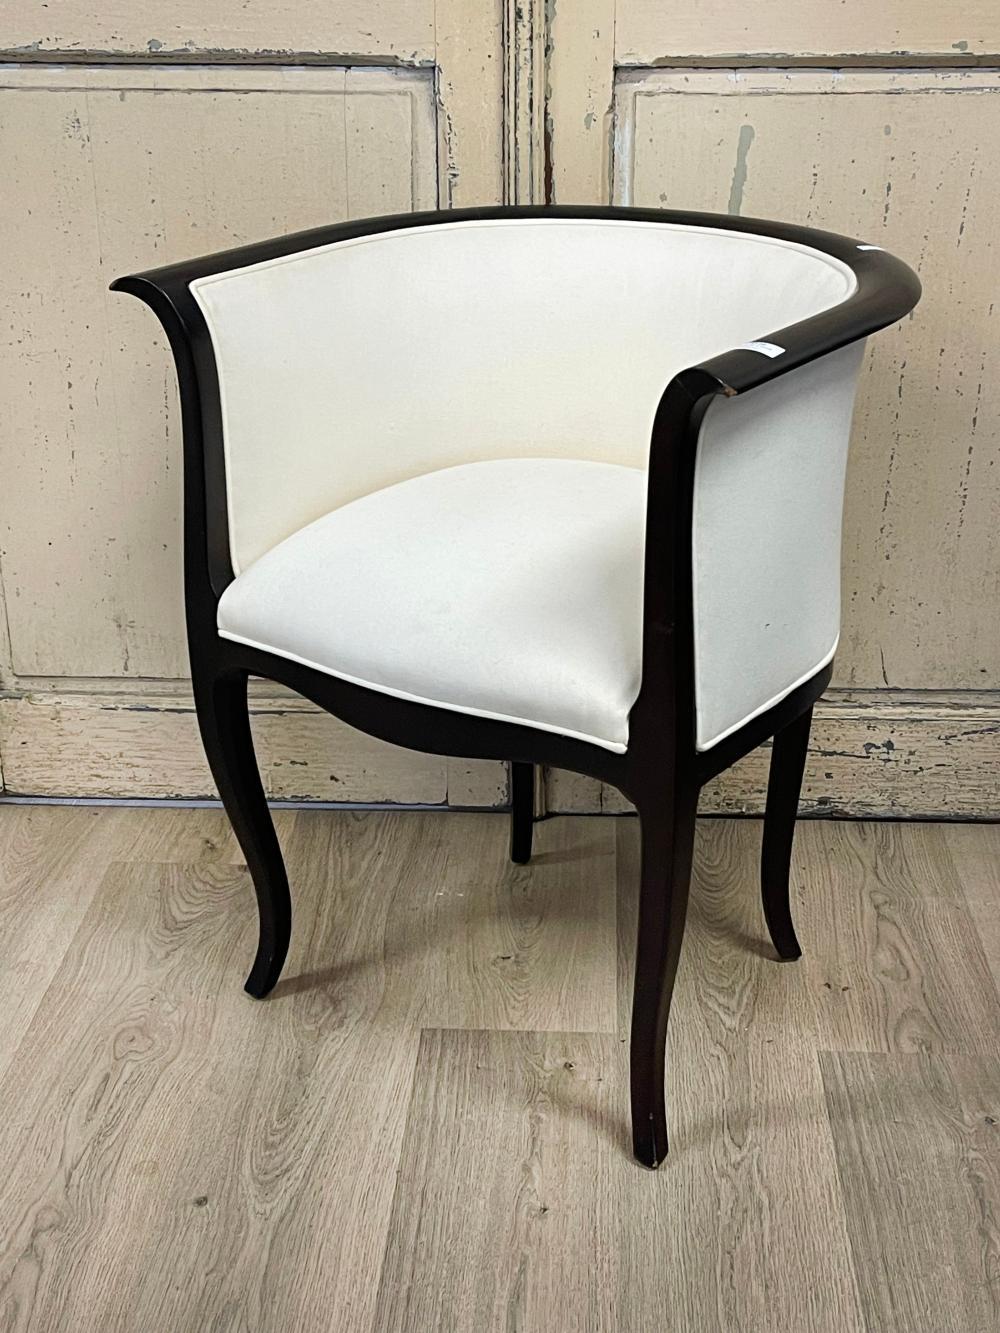 Art Deco revival arm chair